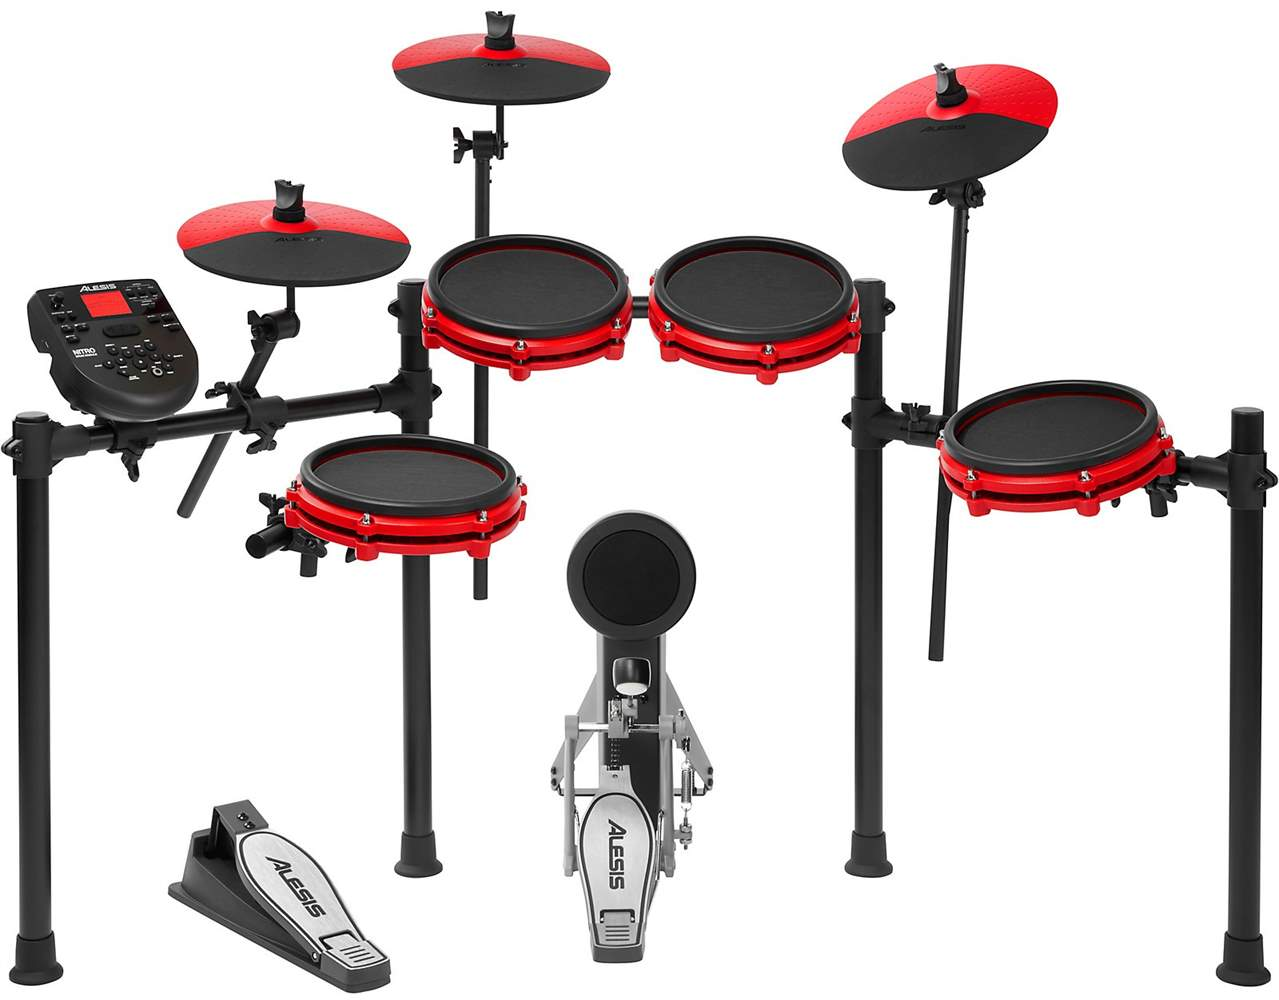 ALESIS Nitro Red Mesh Kit Special Edition Electric Drum Kit